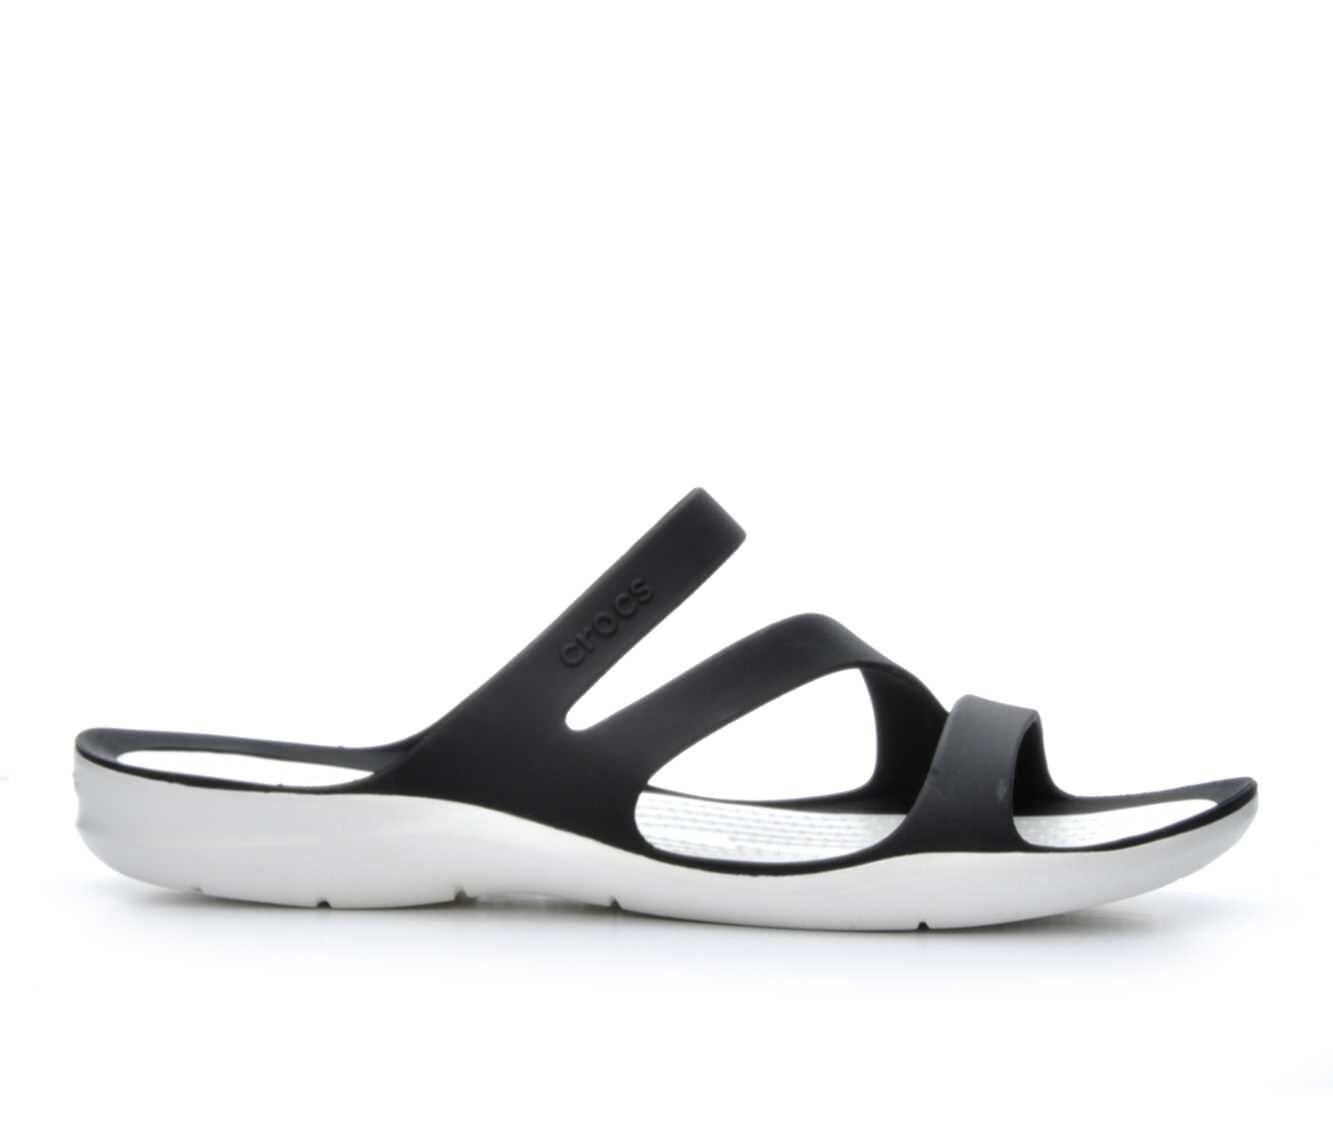 Women's Crocs Swiftwater Strappy Sandals Black/White